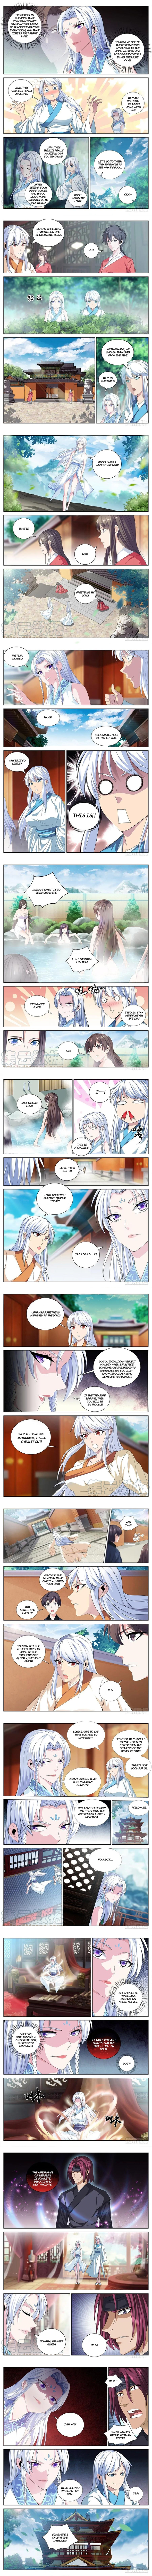 https://manga.mangadogs.com/comics/pic4/29/39645/2178754/6aaeb973a69f014df04e1c240c195744.jpg Page 1